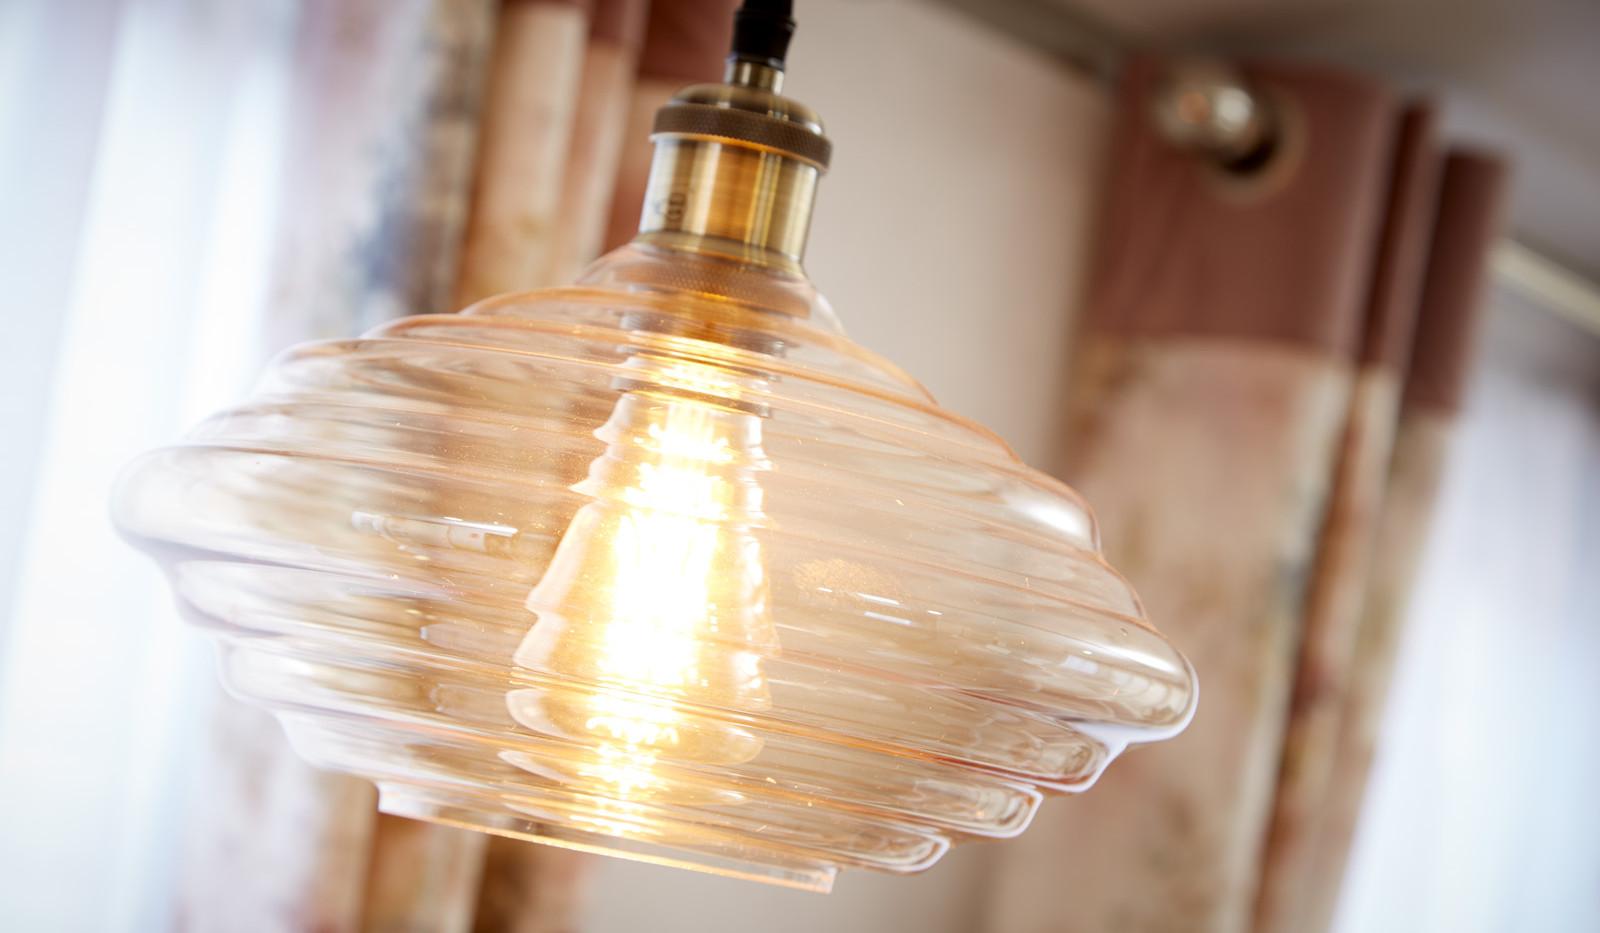 The Image Luxry Lodge Interior light